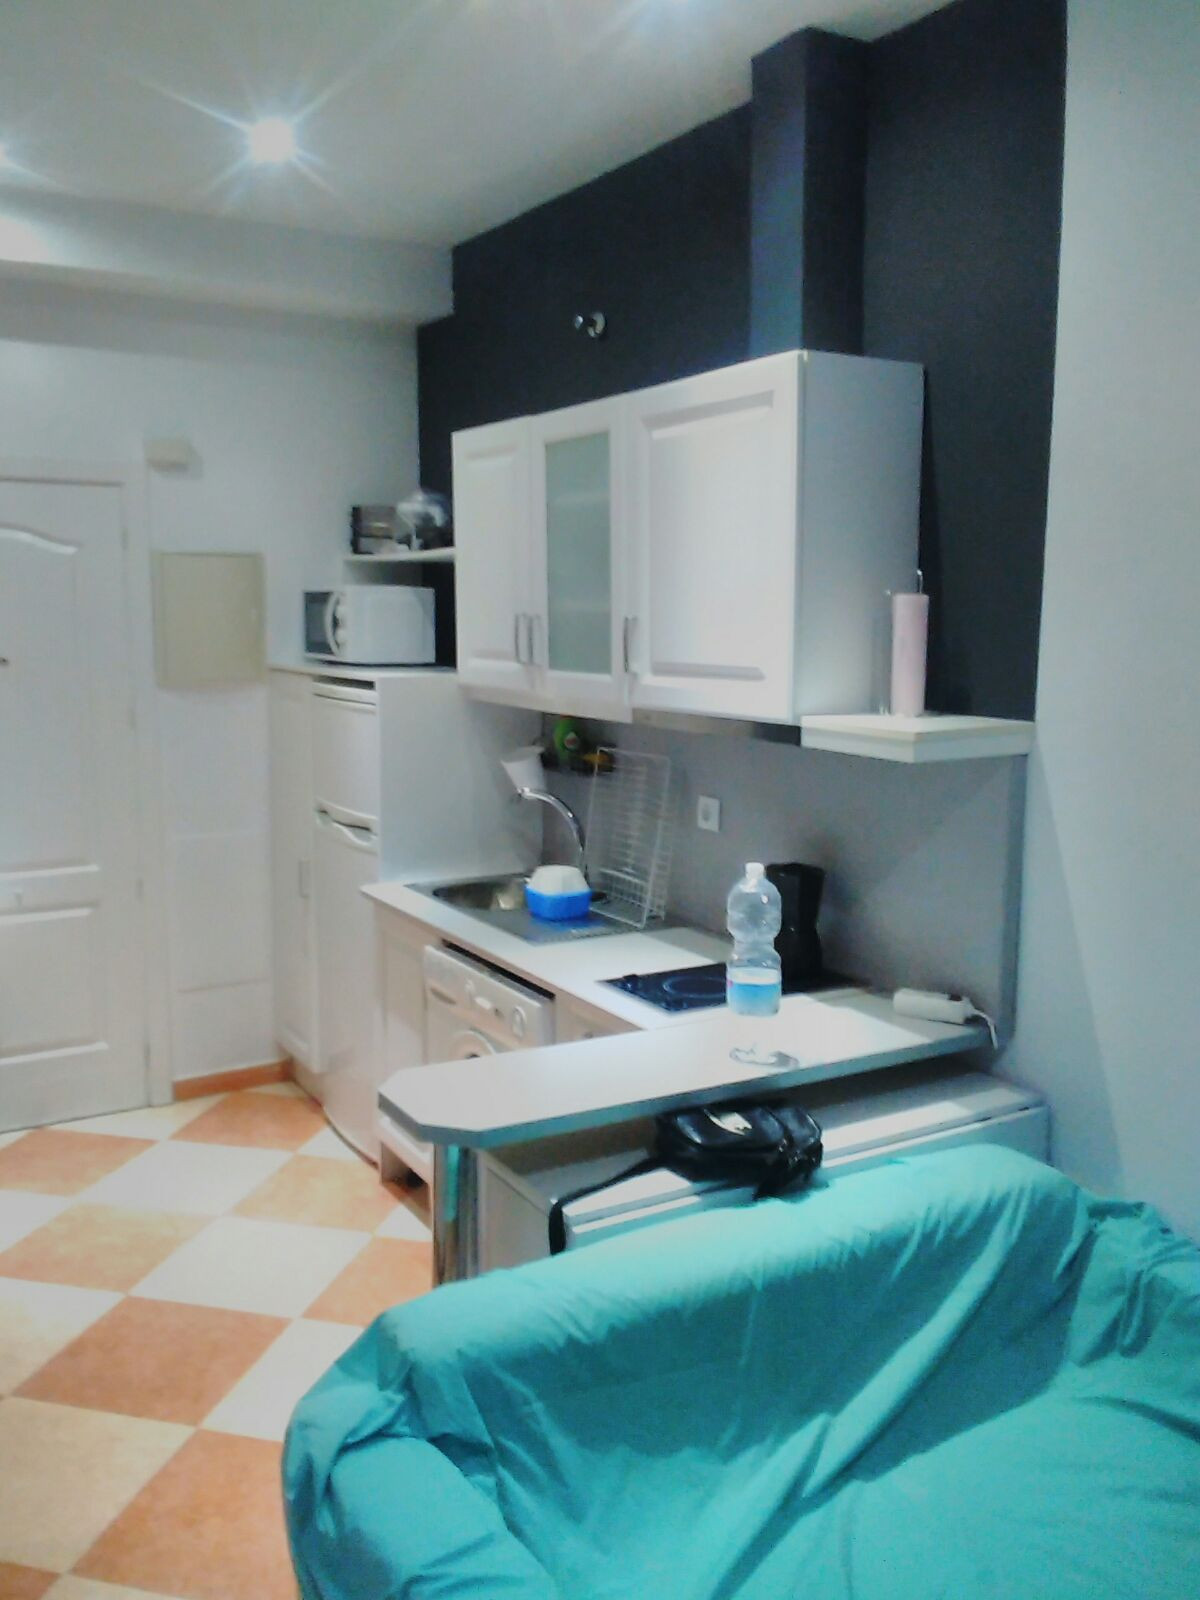 1 Bedroom Middle Floor Apartment For Sale Benalmadena